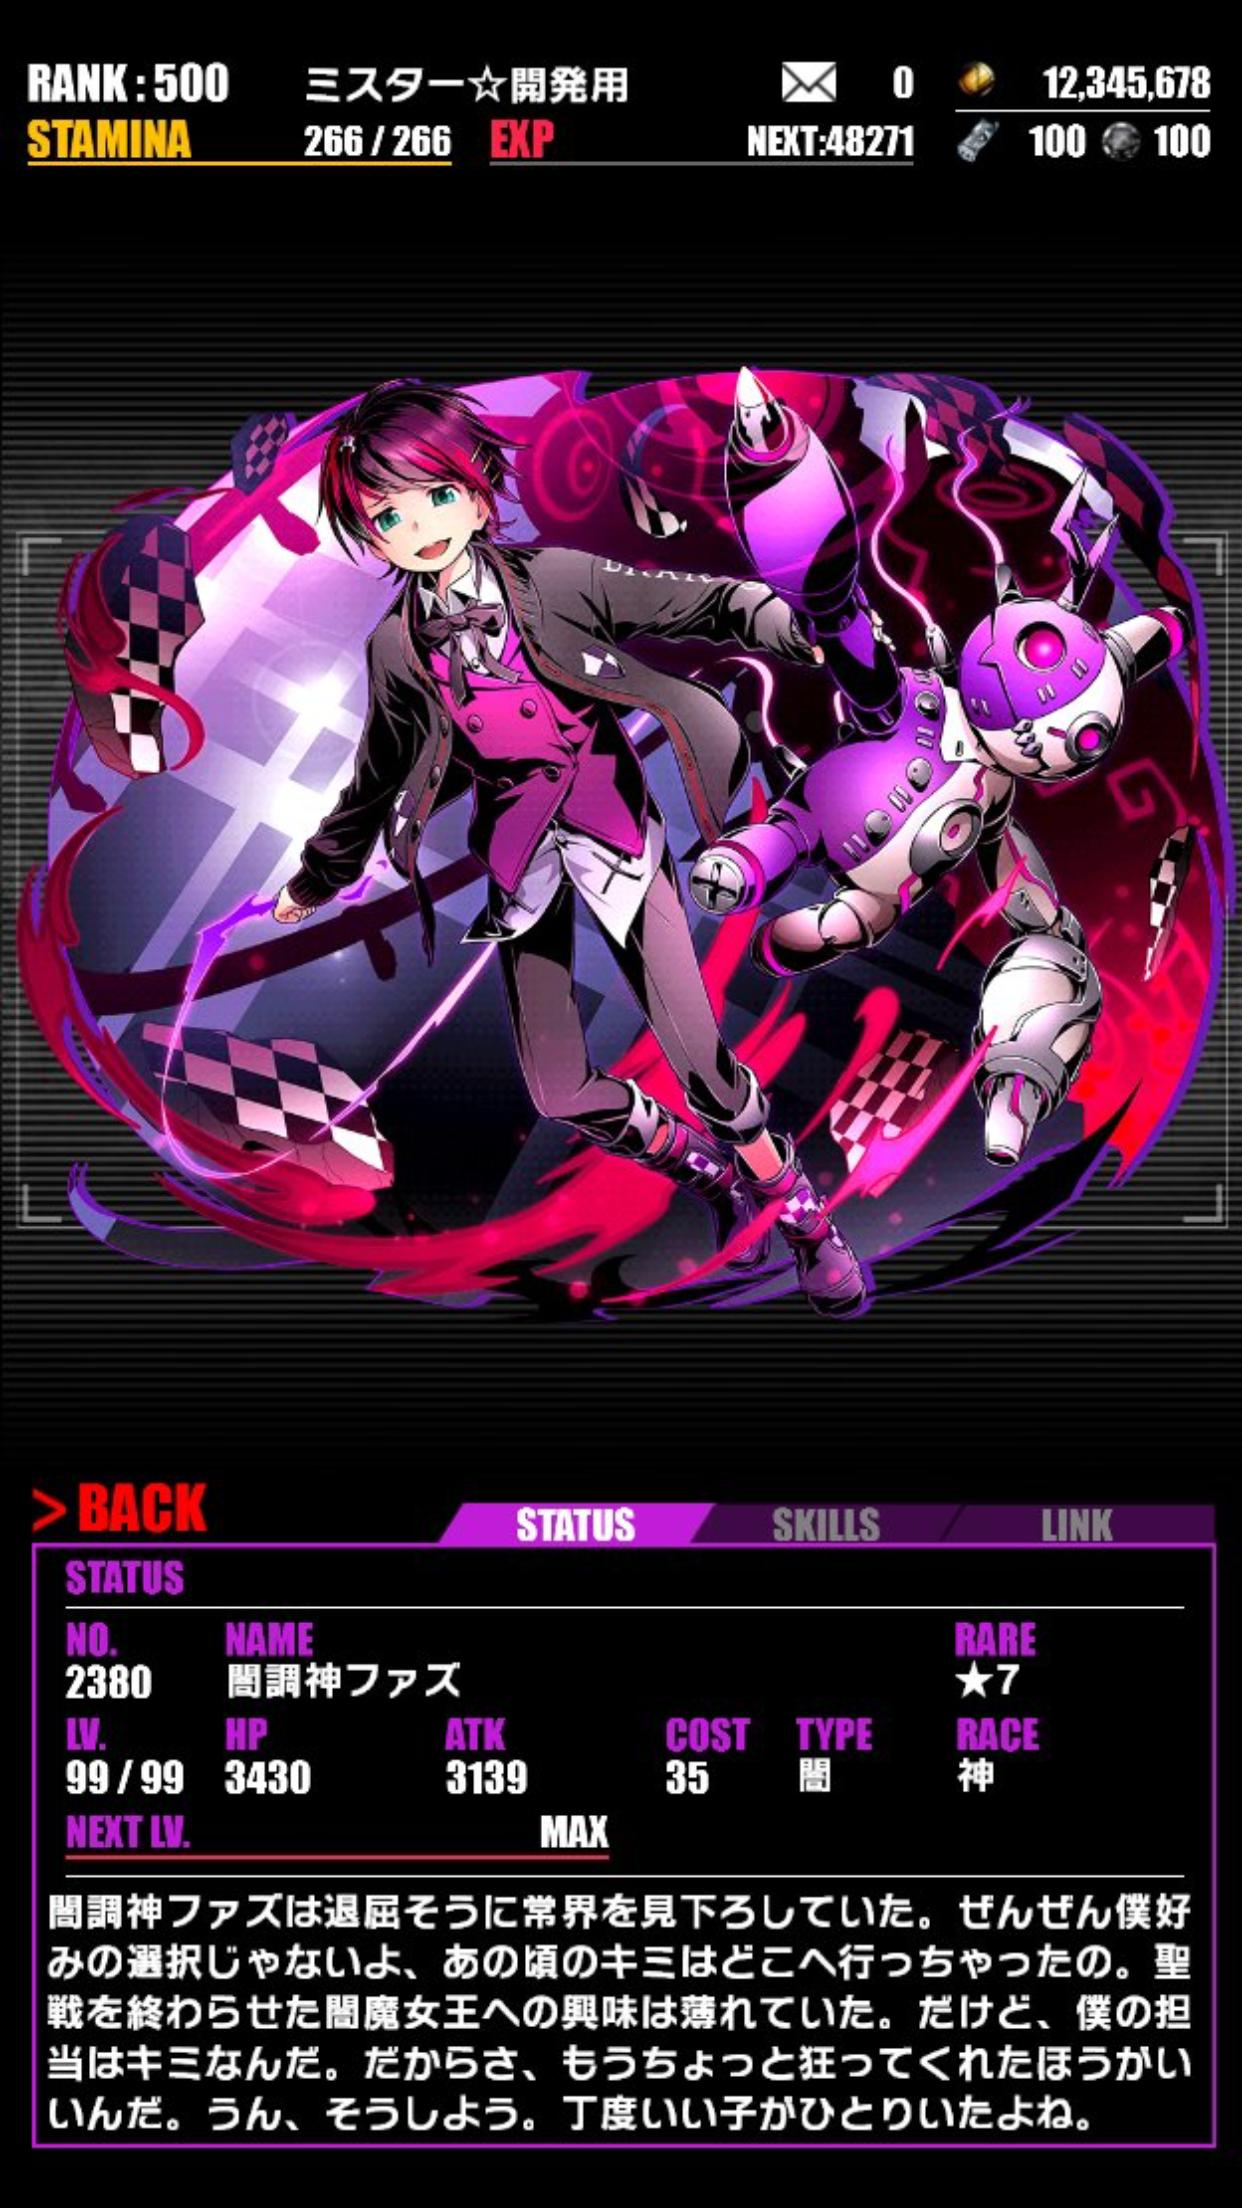 f:id:takumahakusyaku46:20170131021655p:image